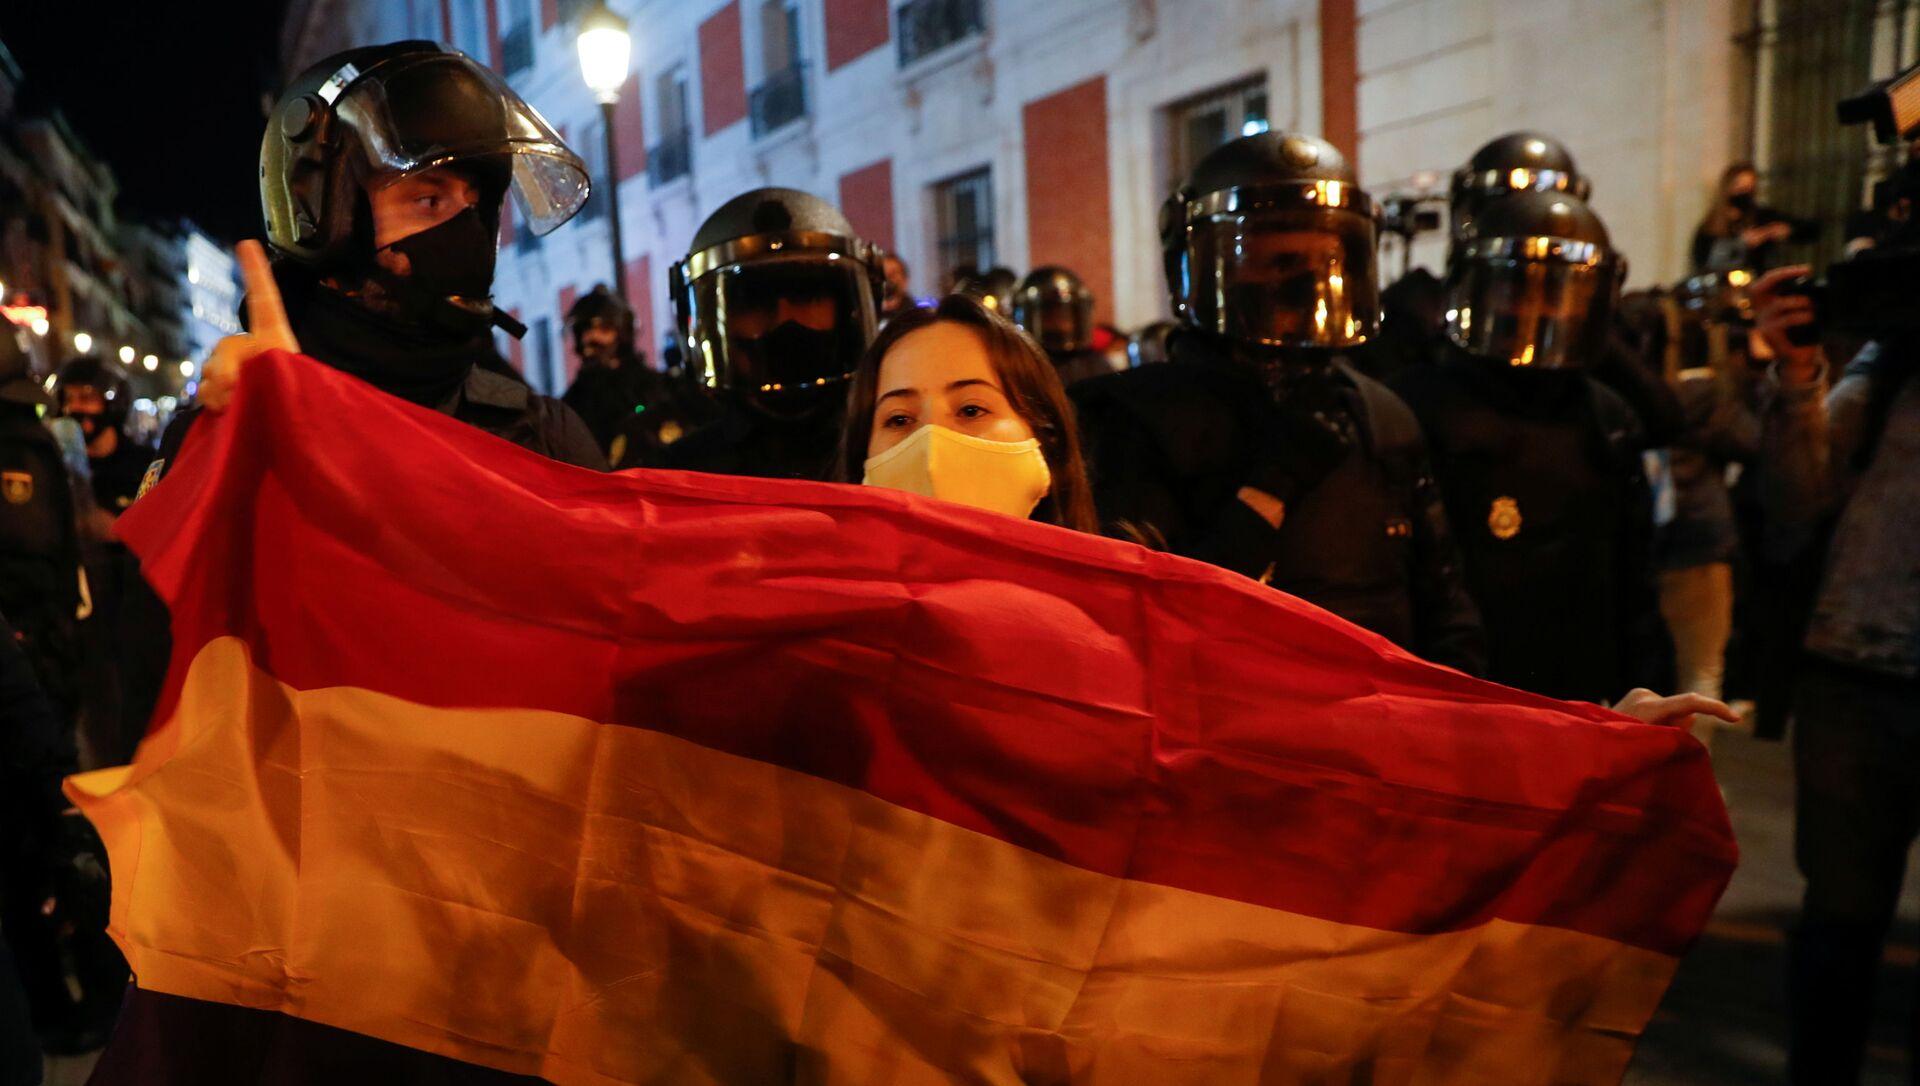 Девушка с испанским республиканским флагом во время протеста сторонников каталонского рэпера Пабло Хазеля в Мадриде, Испания - Sputnik Italia, 1920, 02.03.2021